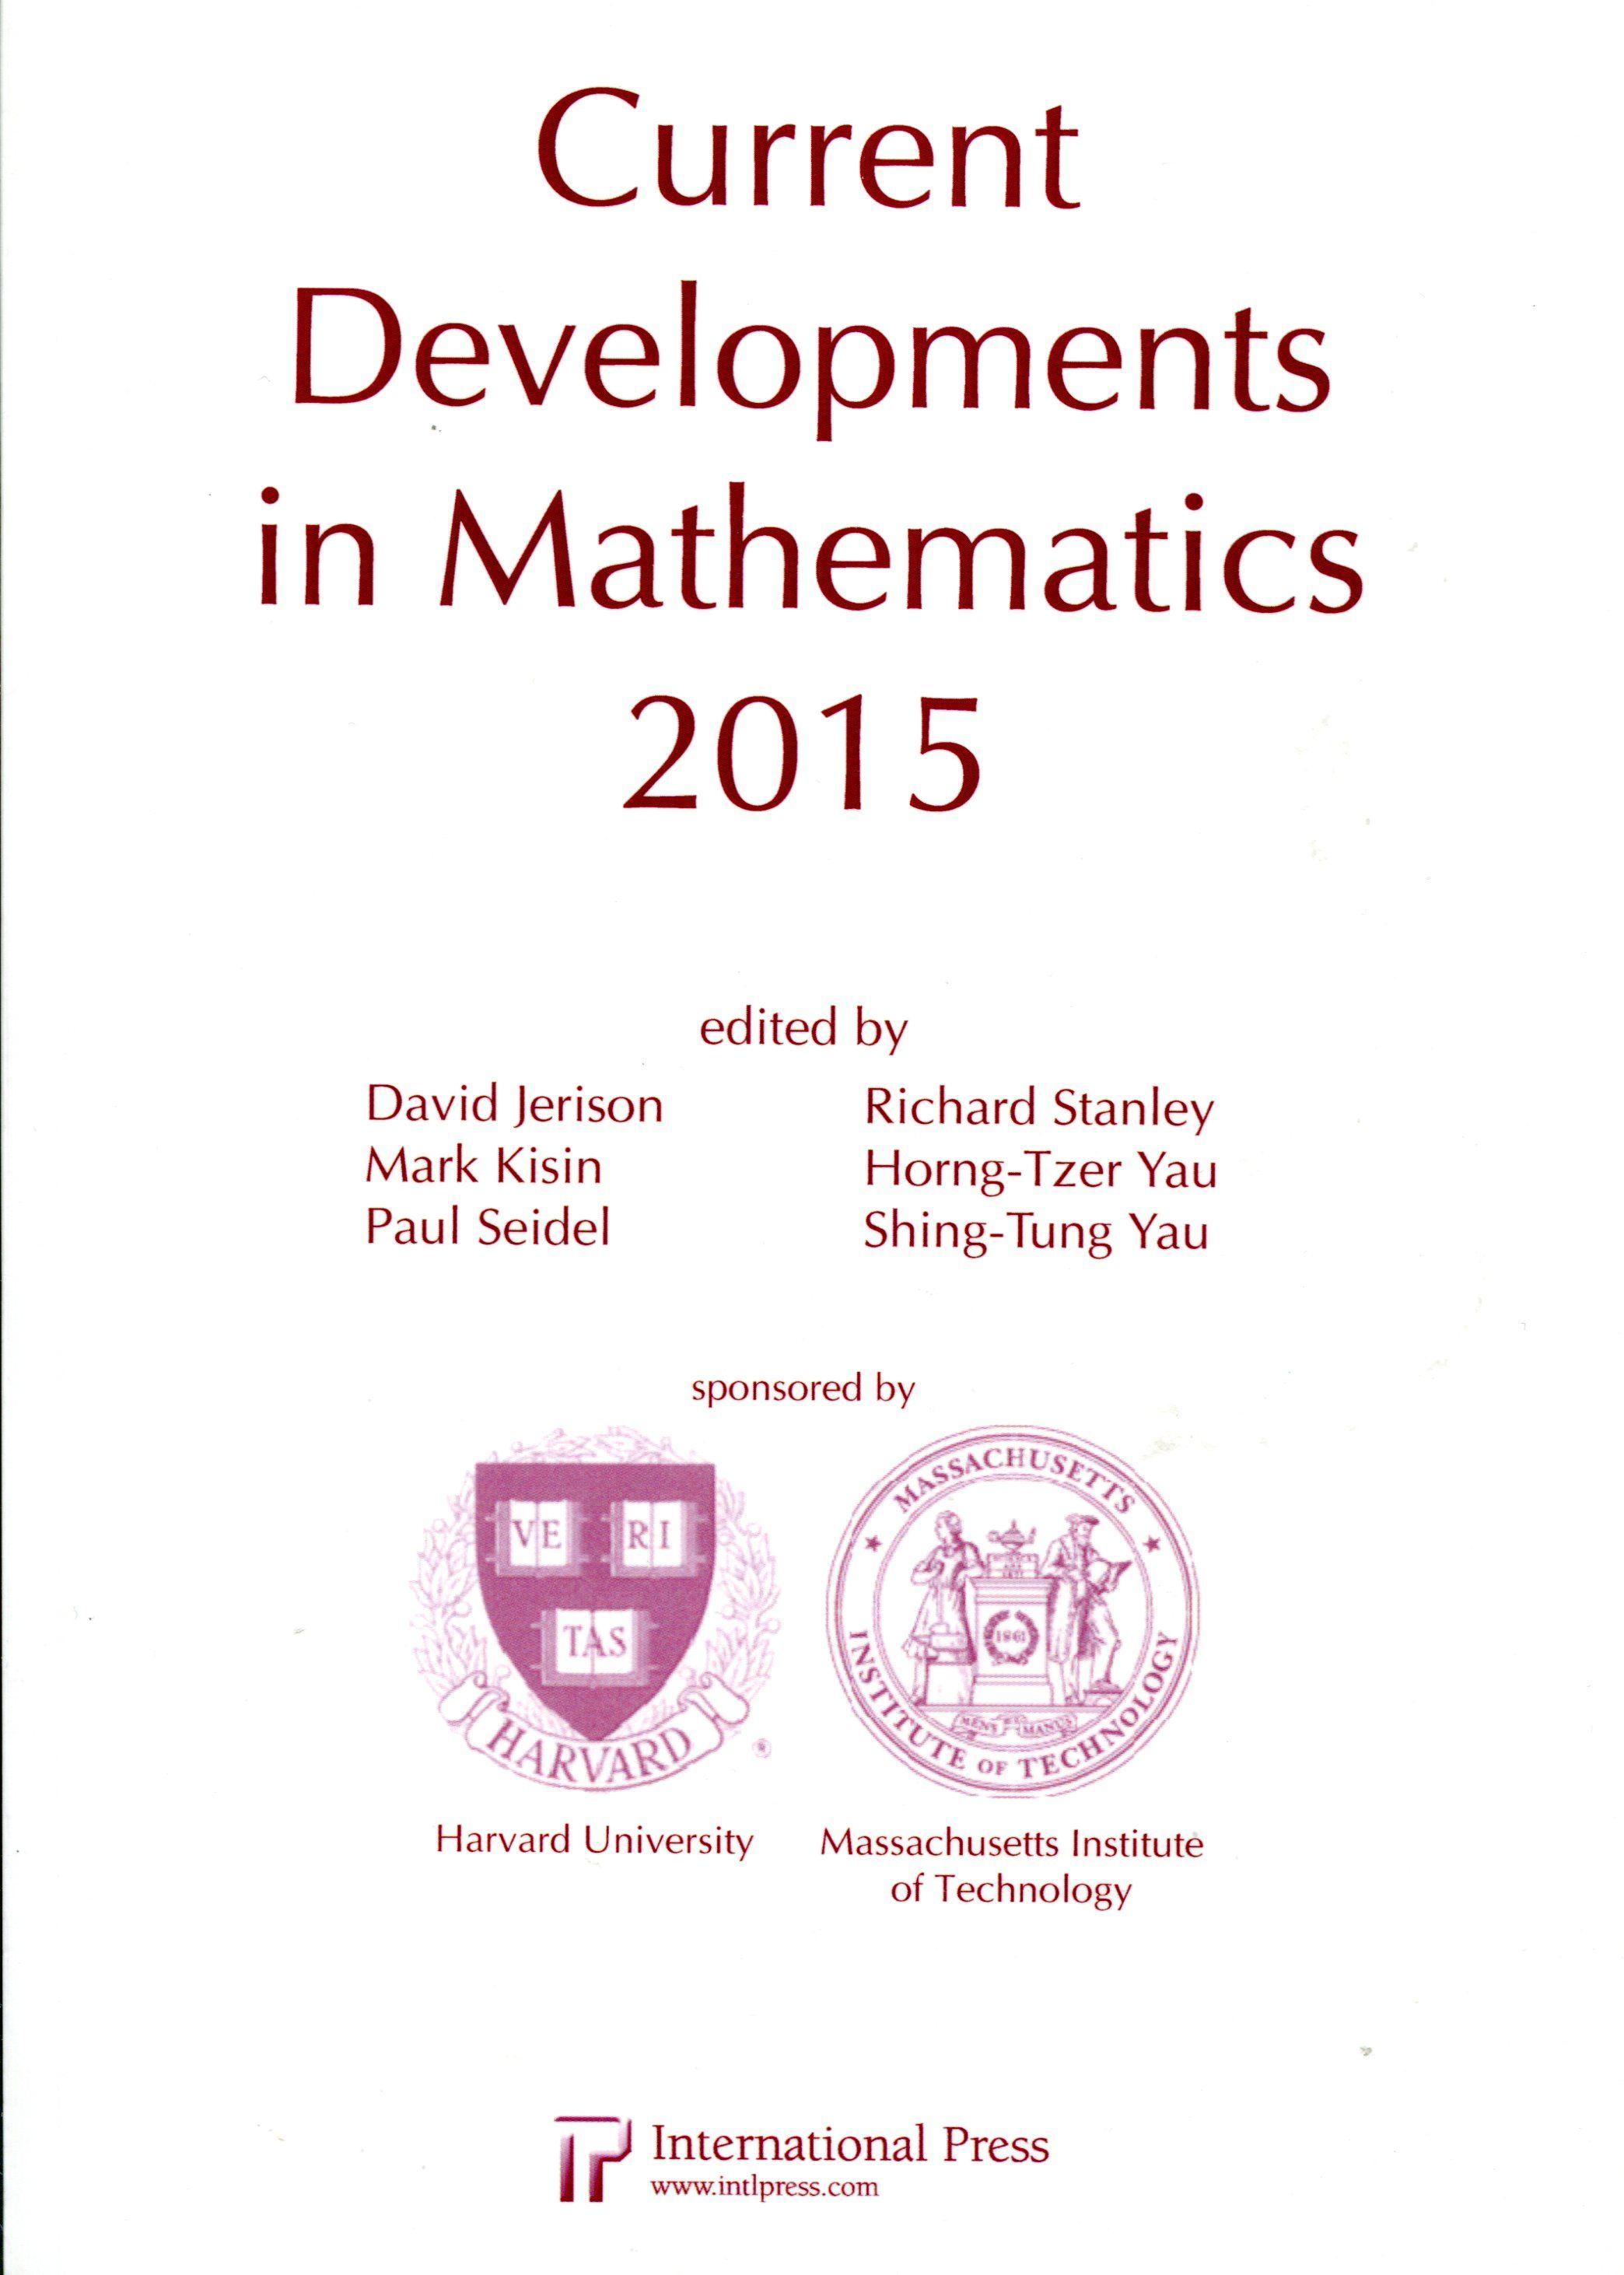 Current developments in mathematics, 2015 / Editors David      Jerison...  [et al.] ; [Sponsored by Harvard University,      Massachusetts Institute of Technology].-- Somerville, MA :      International Press, 2016. Ver localización en la Biblioteca de la ULL:http://absysnetweb.bbtk.ull.es/cgi-bin/abnetopac01?TITN=555770